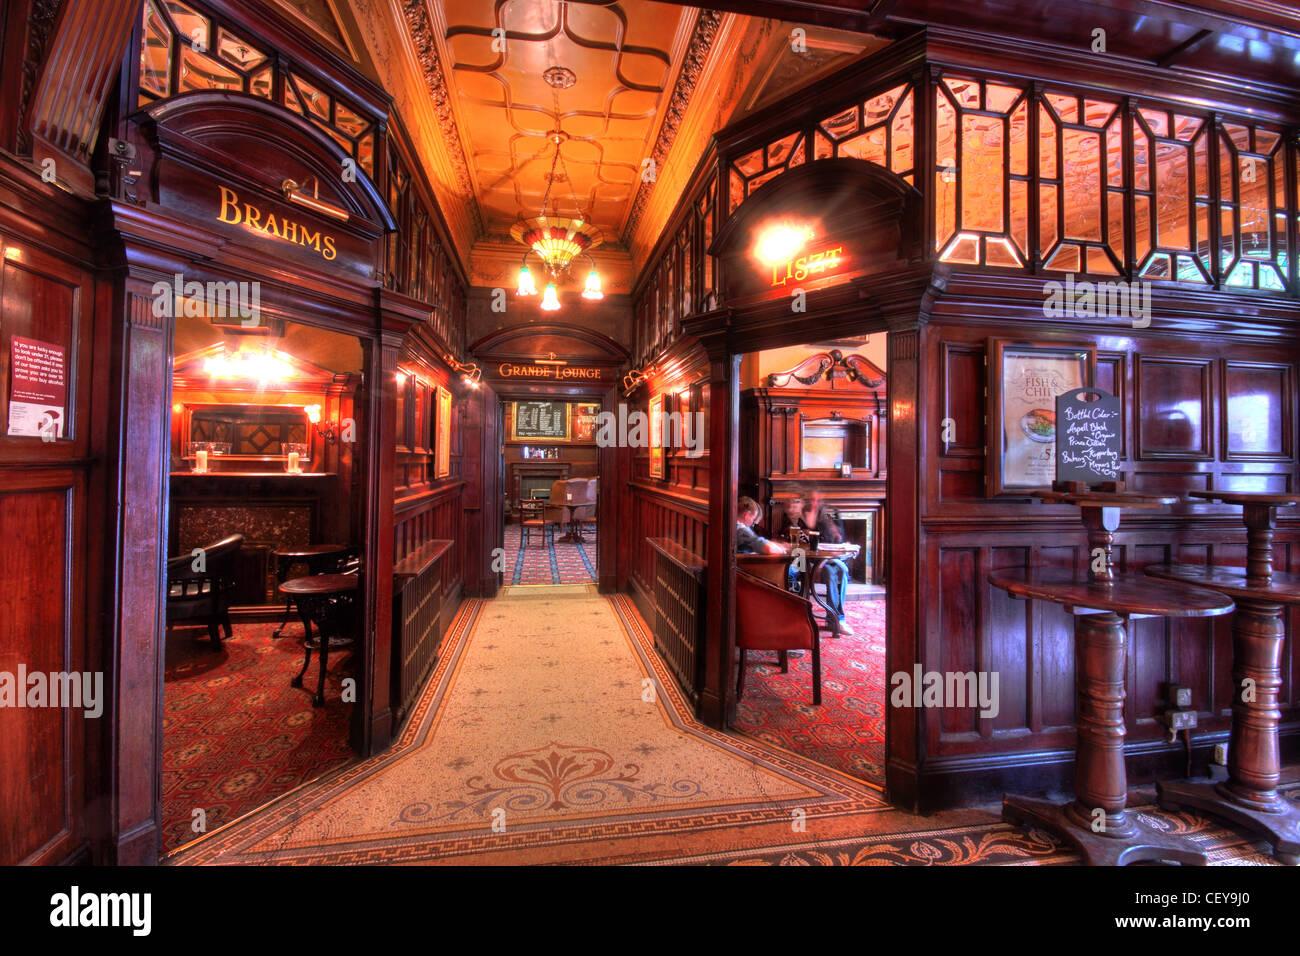 Famous Old London Restaurants